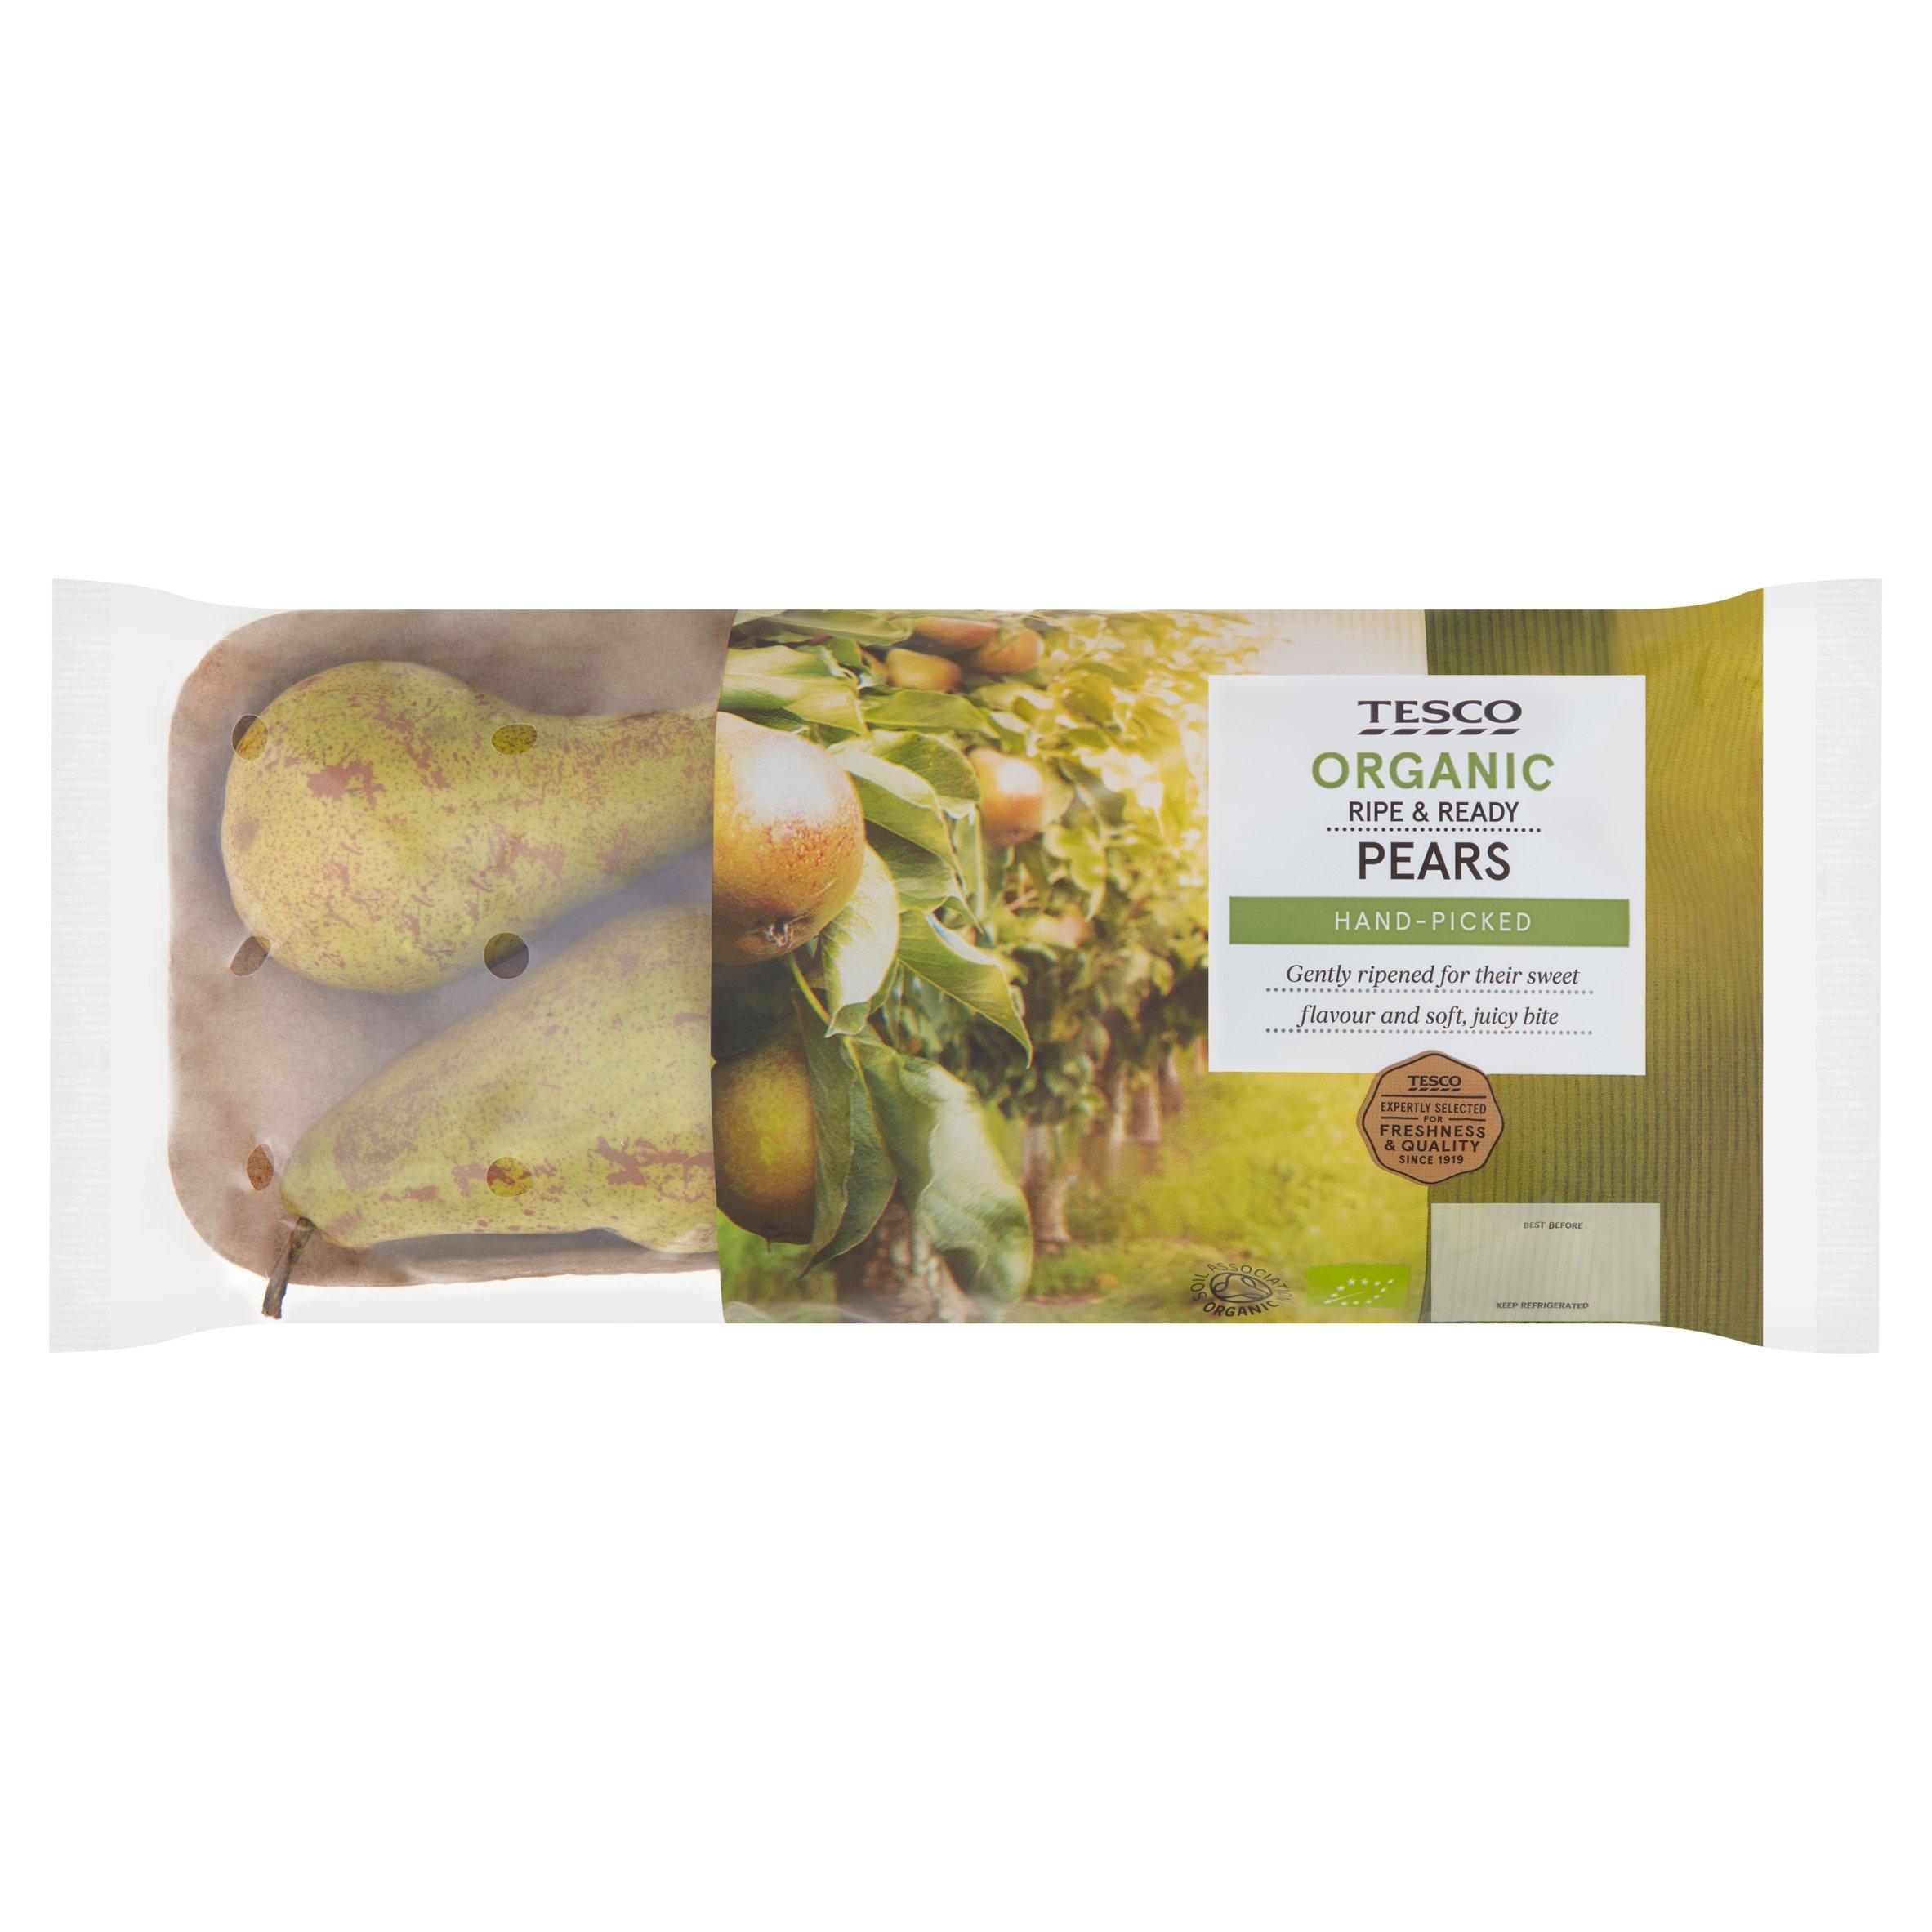 Tesco Organic Ripe & Ready Pears 550G